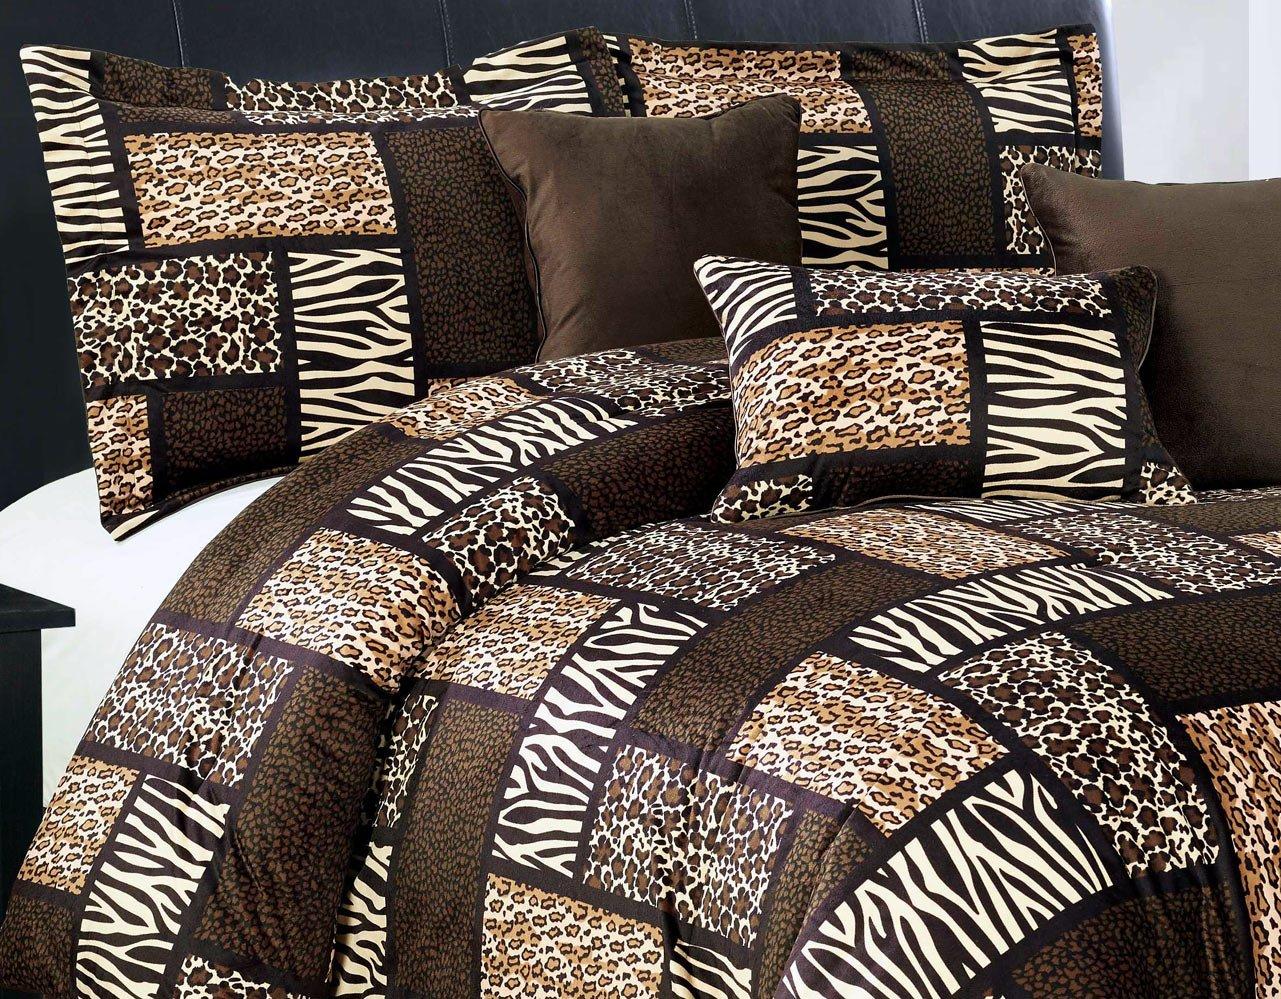 7 Piece Queen Safari Micro Fur Comforter Set - Zebra, Giraffe, Leopard, Tiger Etc - Multi Animal Print Bed in a Bag Brown Beige Black White Bedding